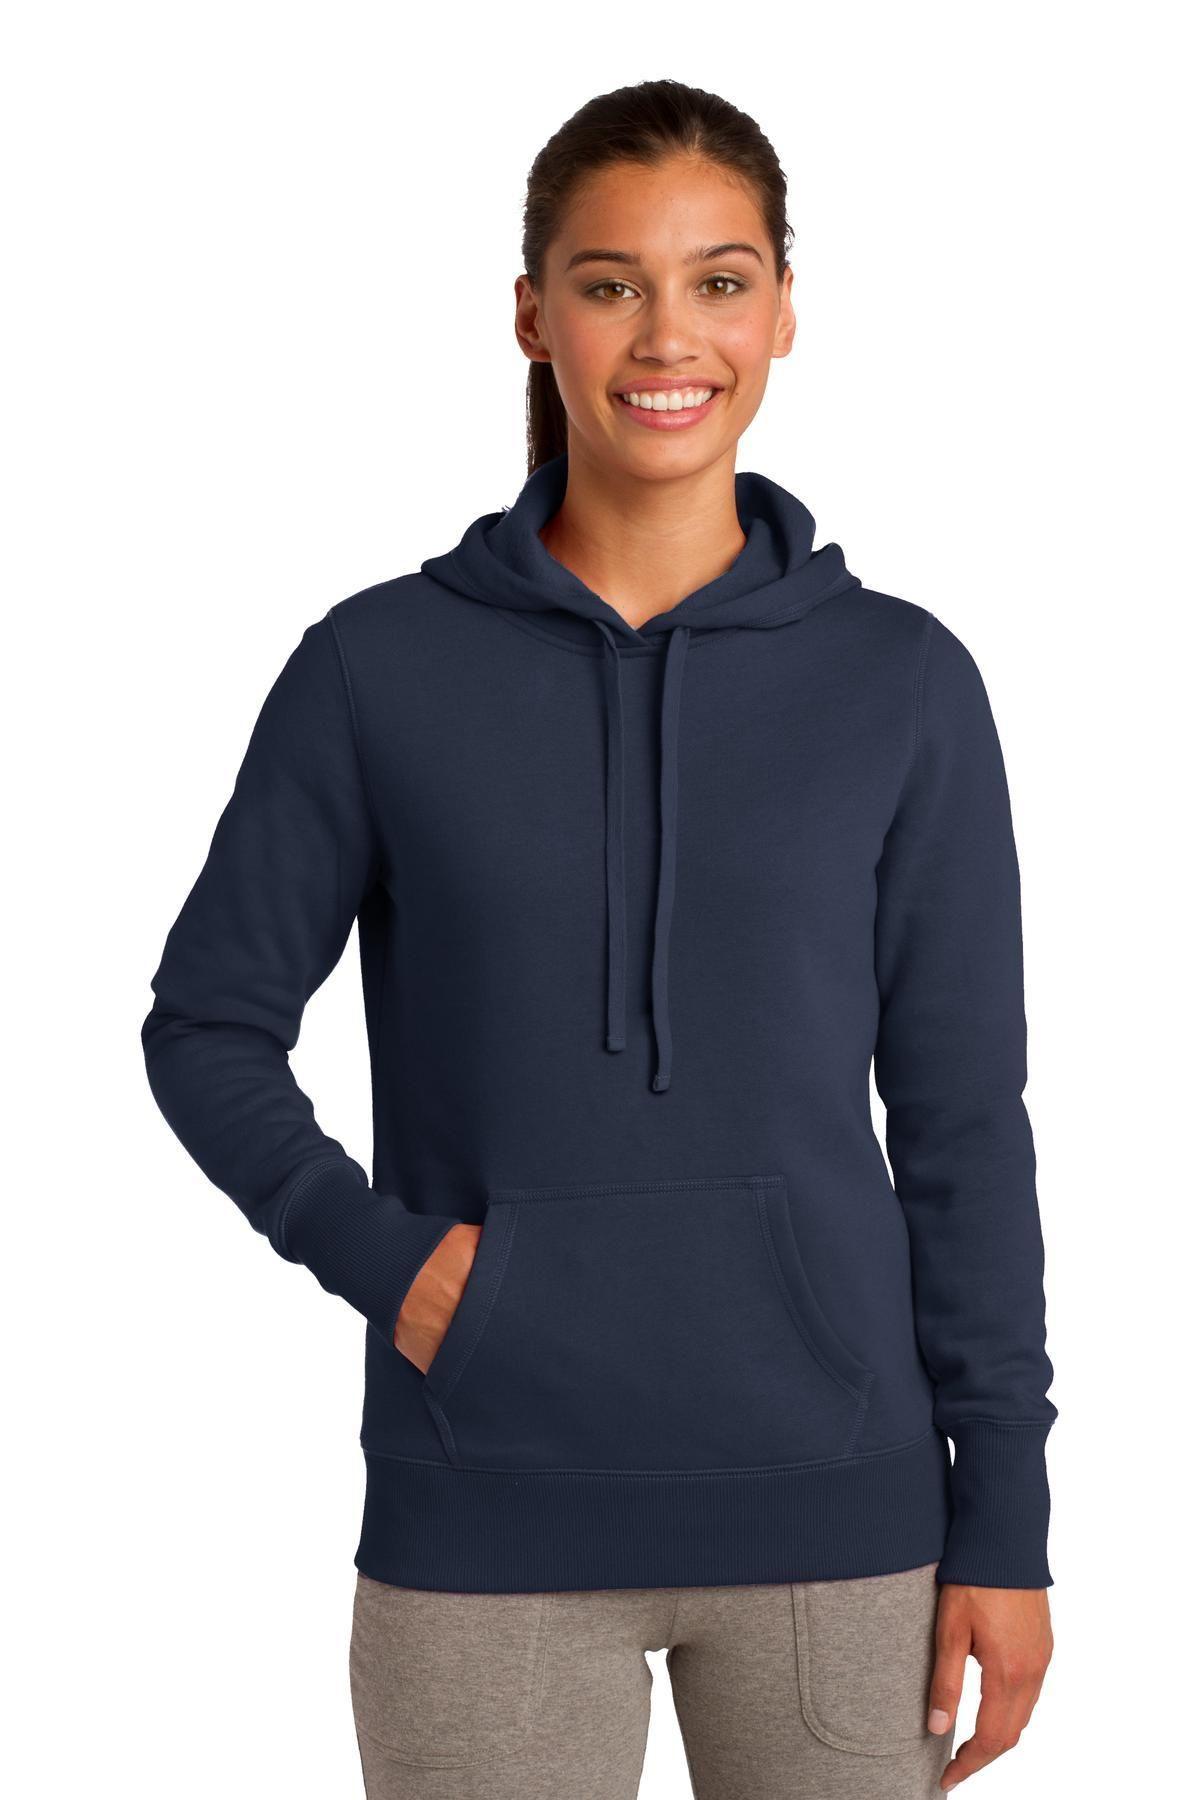 SportTek Men's Graphite Heather Tall FullZip Sweatshirt